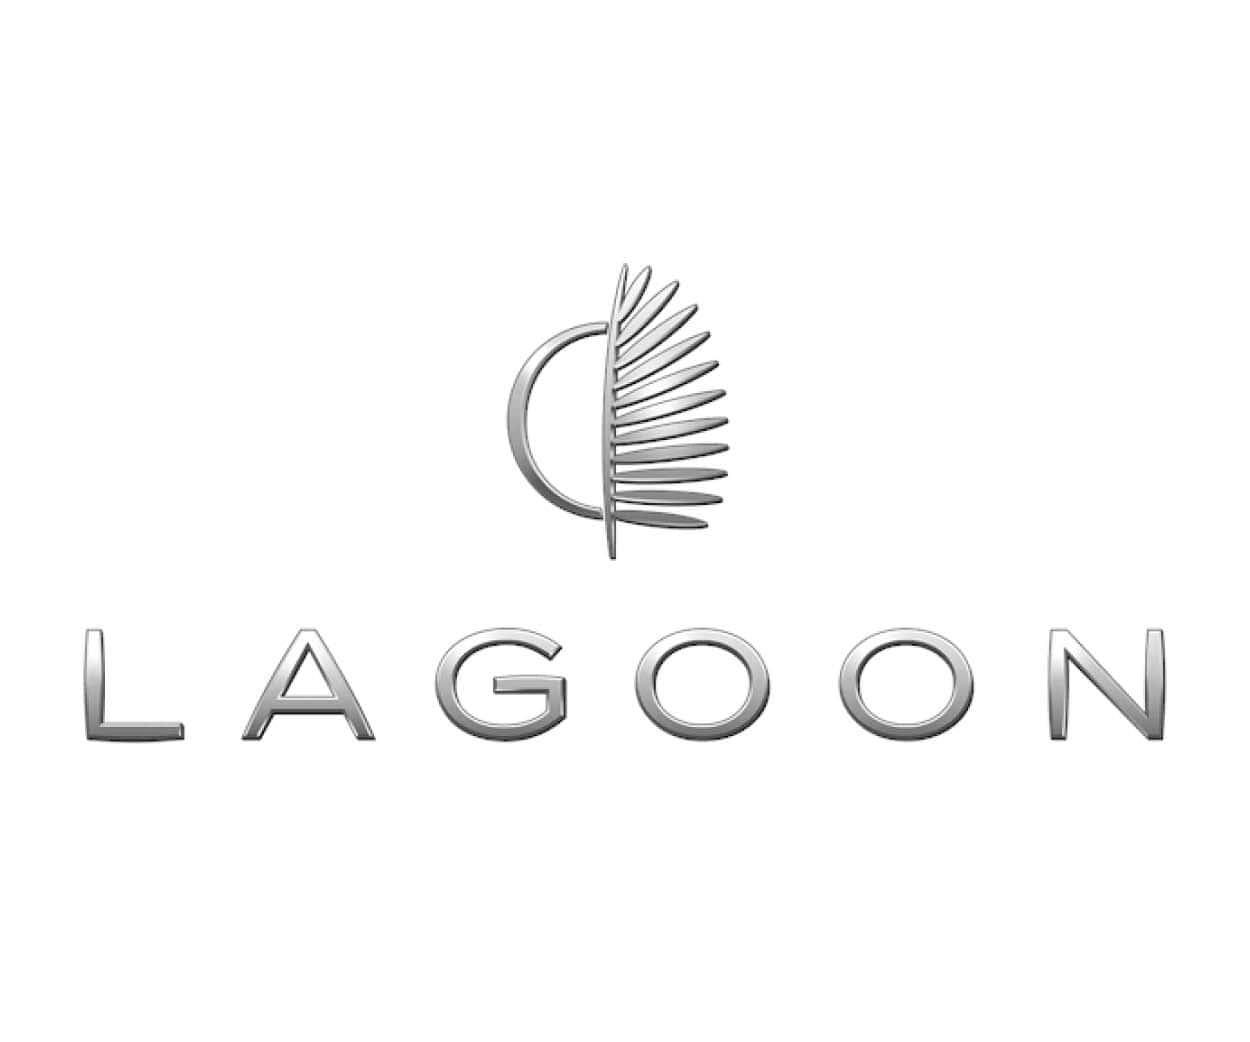 Lagoon Motors